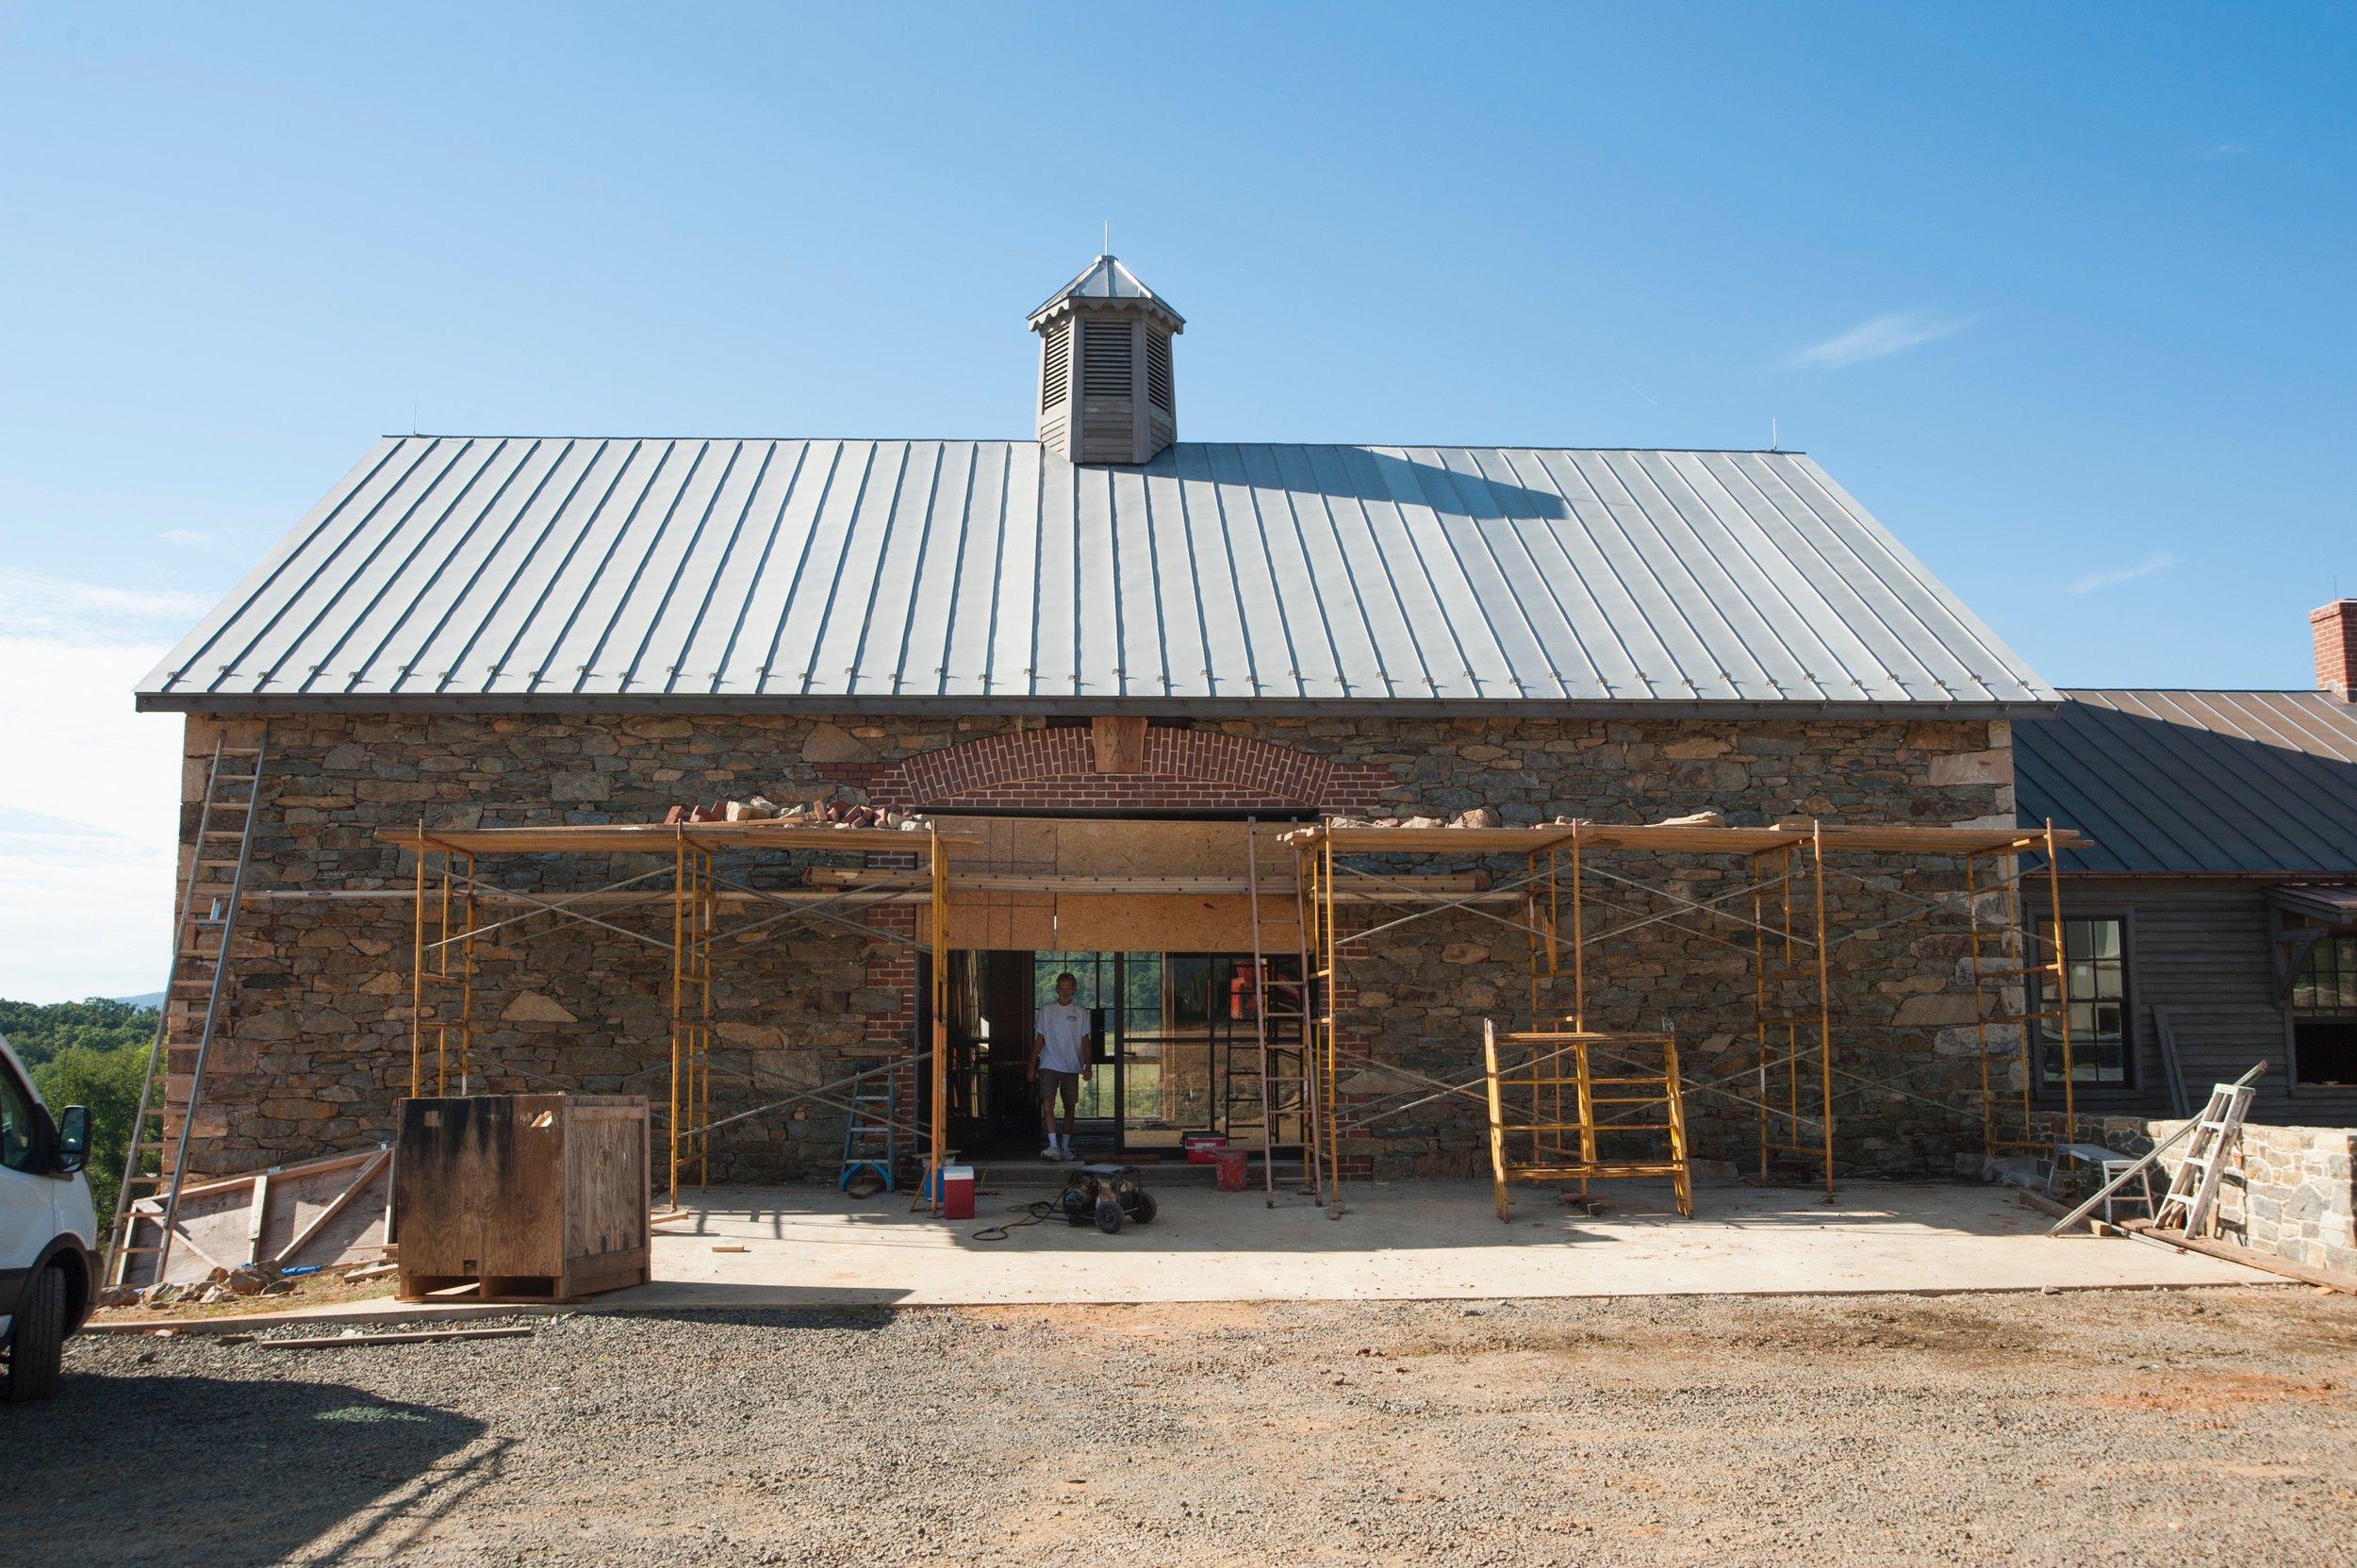 Upper level of the barn at Washington, Virginia.